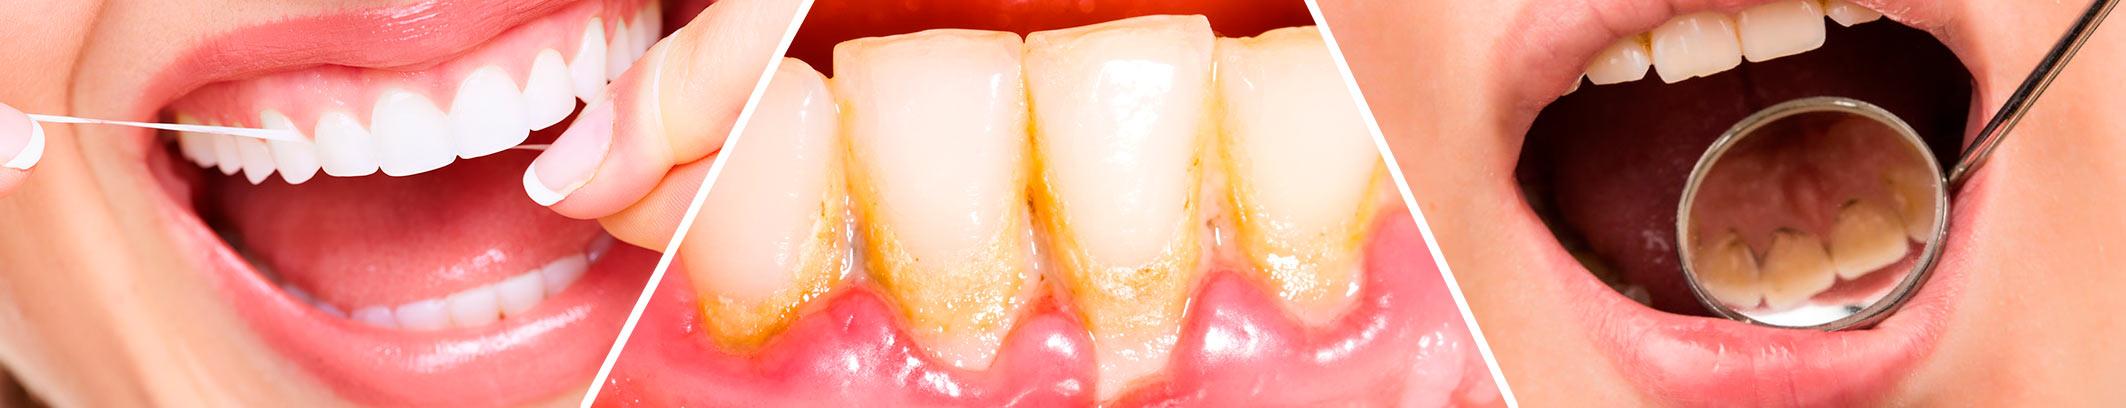 profesionalno čišćenje zubi